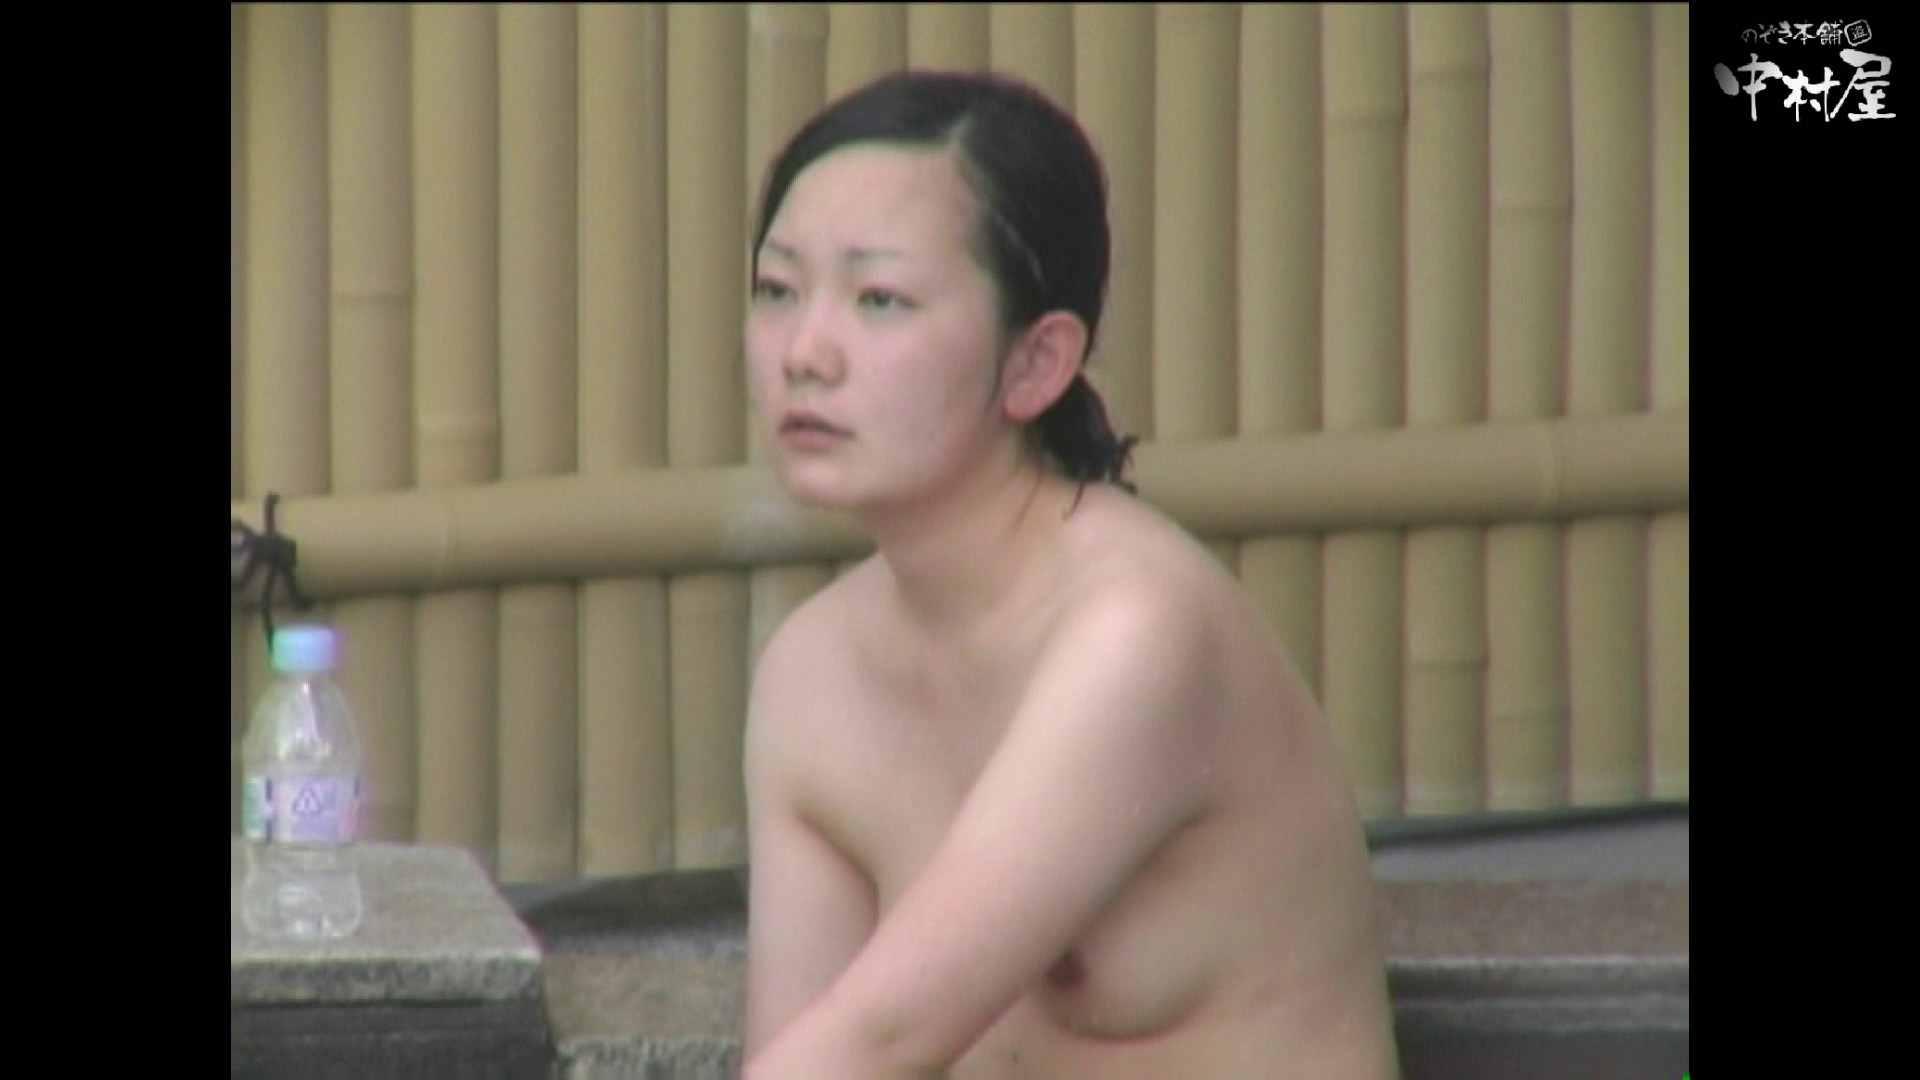 Aquaな露天風呂Vol.892 盗撮 われめAV動画紹介 80画像 62